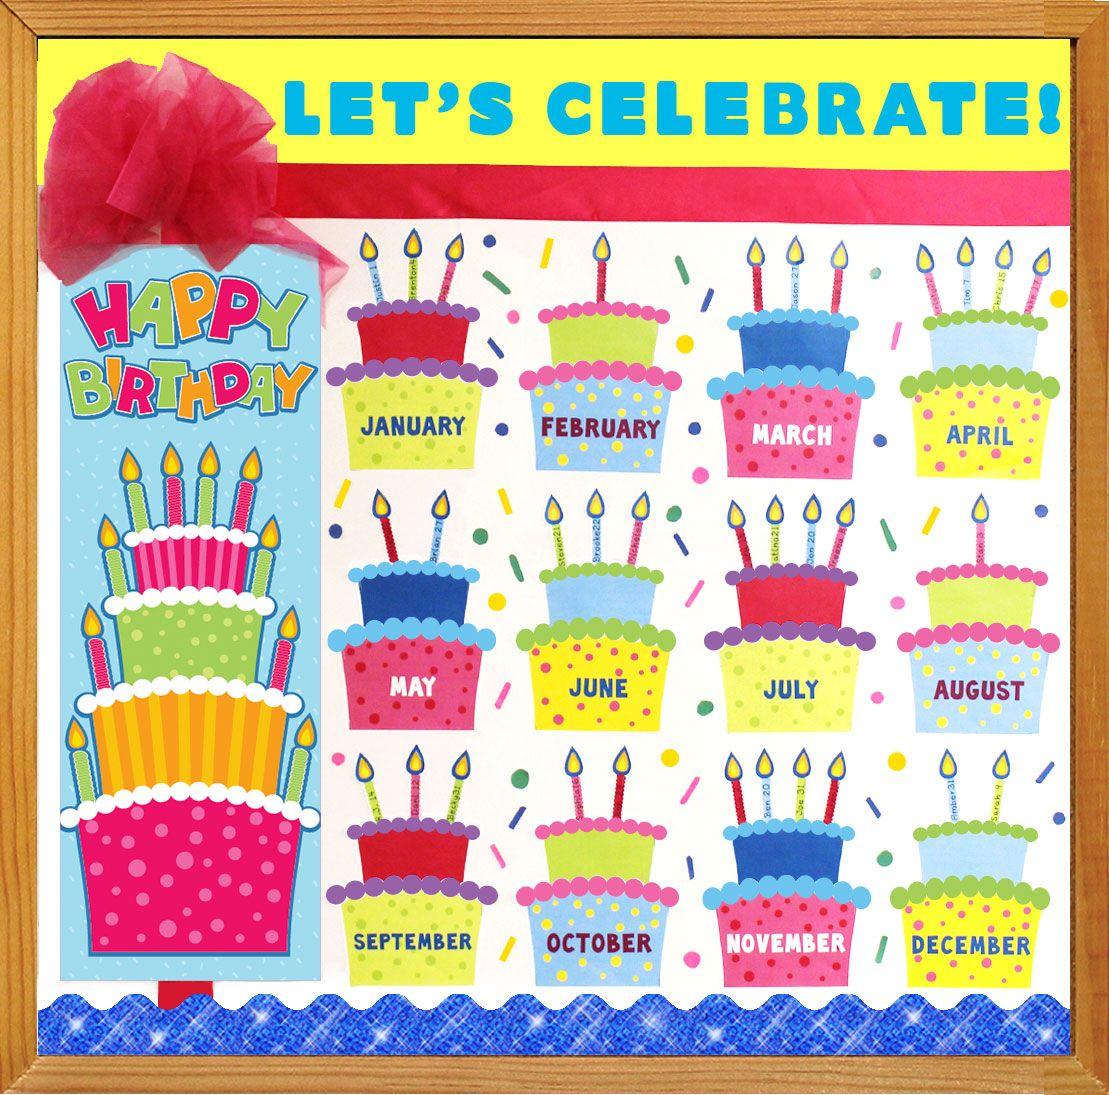 Kids Birthday Calendar : Make a birthday bulletin board to celebrate all of your